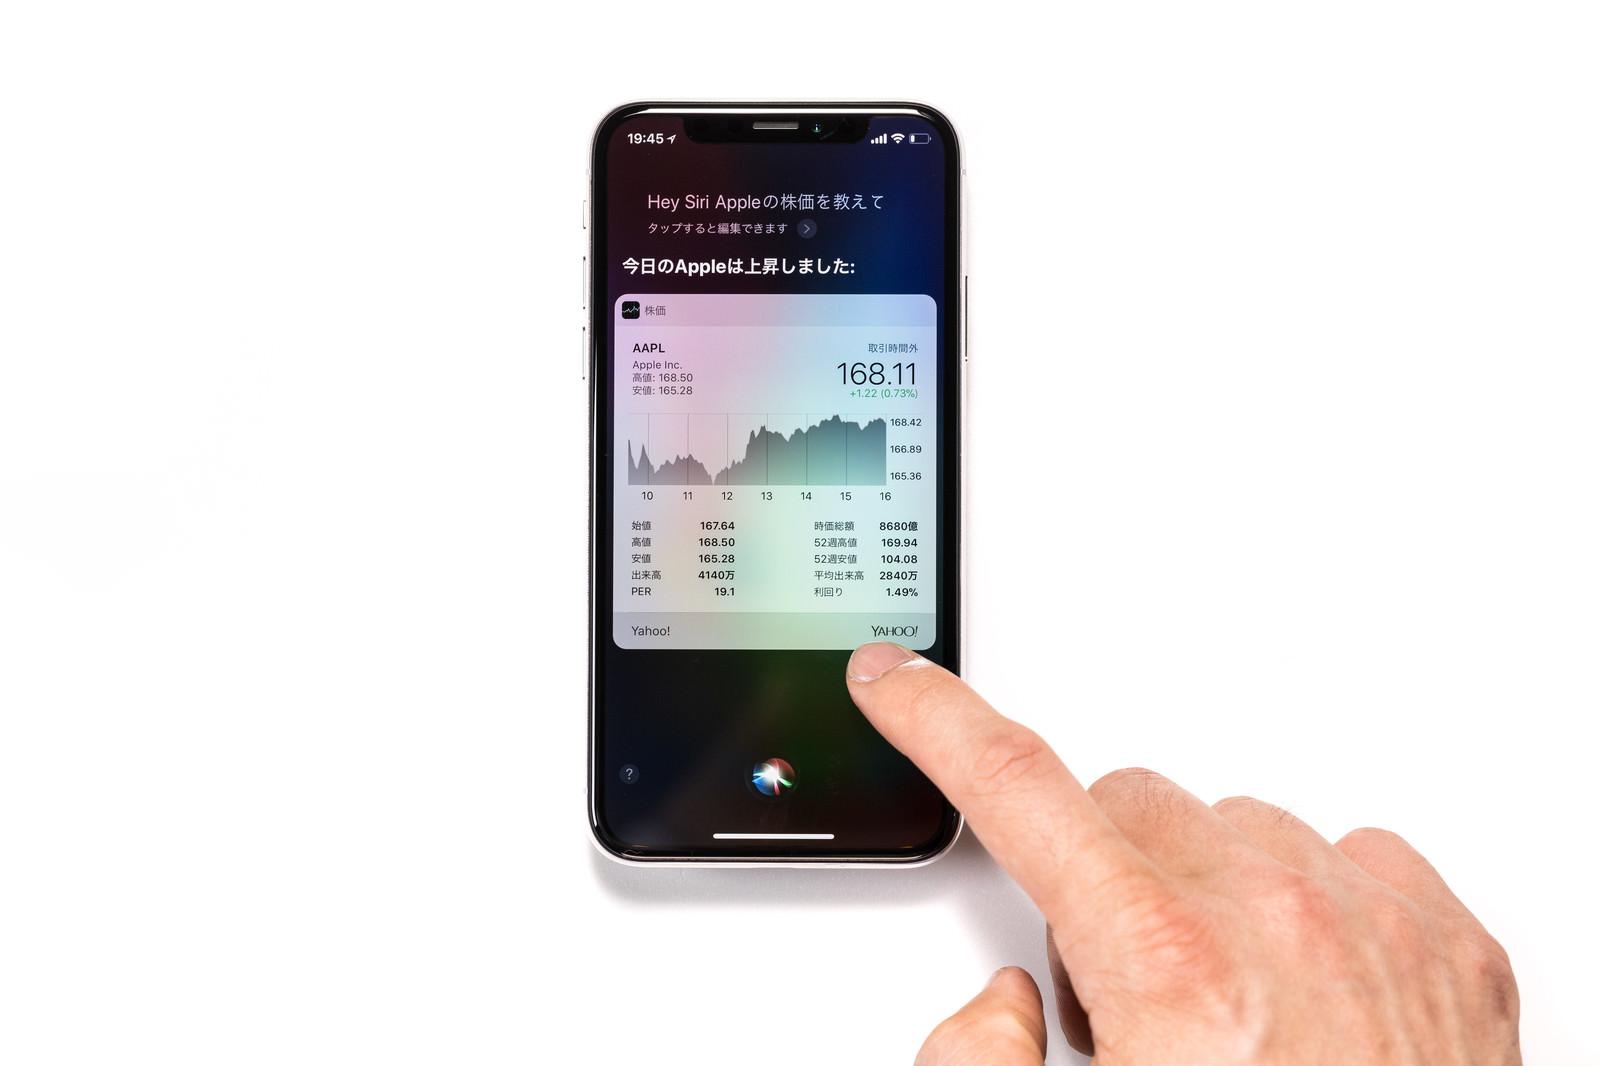 「iPhone X で株価を確認」の写真